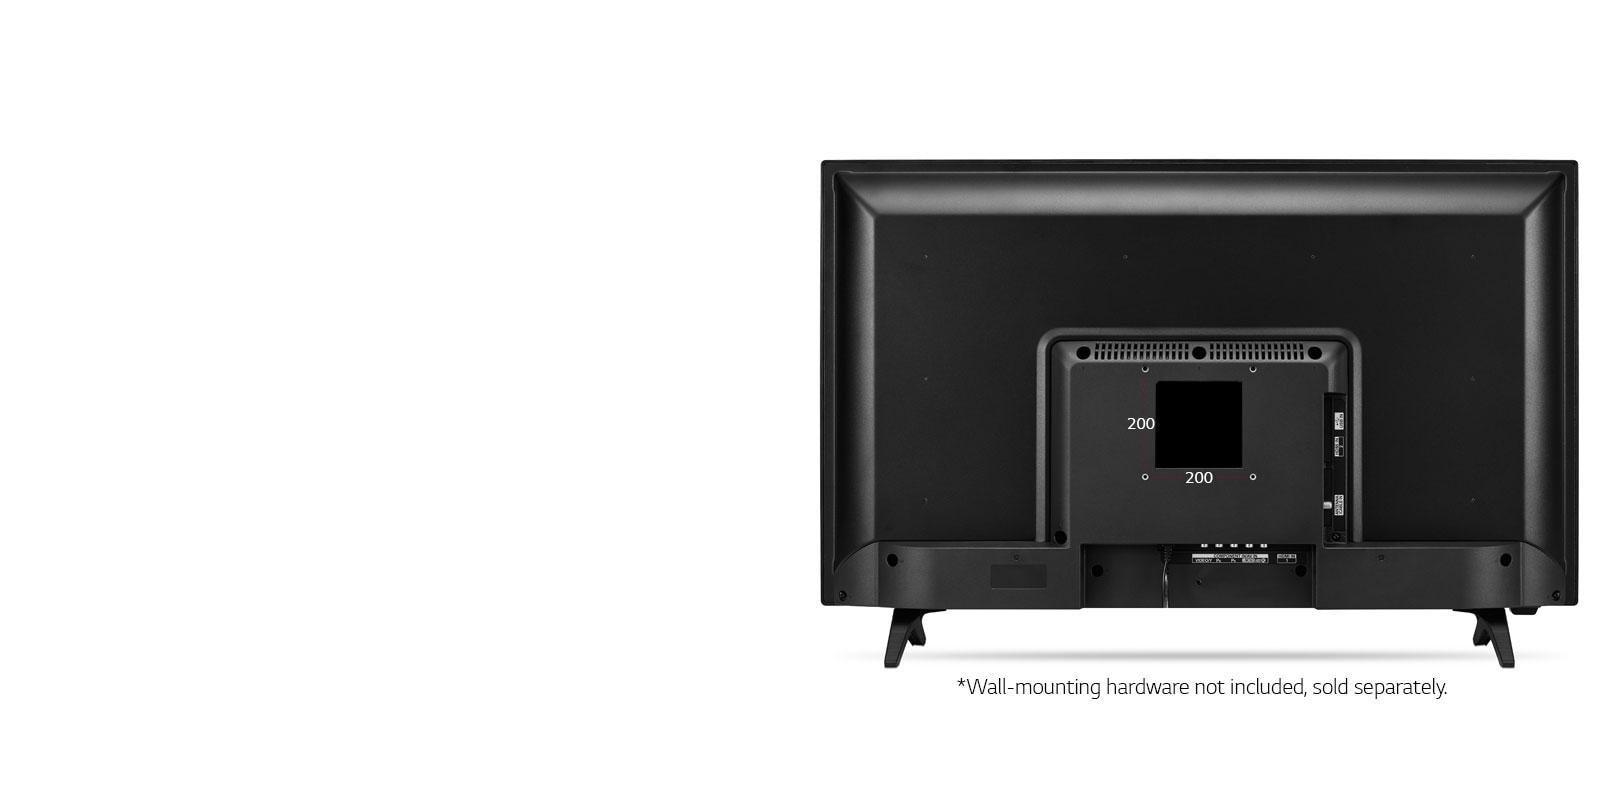 Lg 43lj5000 43 Inch Full Hd 1080p Led Tv Usa Whole Home Surround Sound Wiring Vesa 091017 D